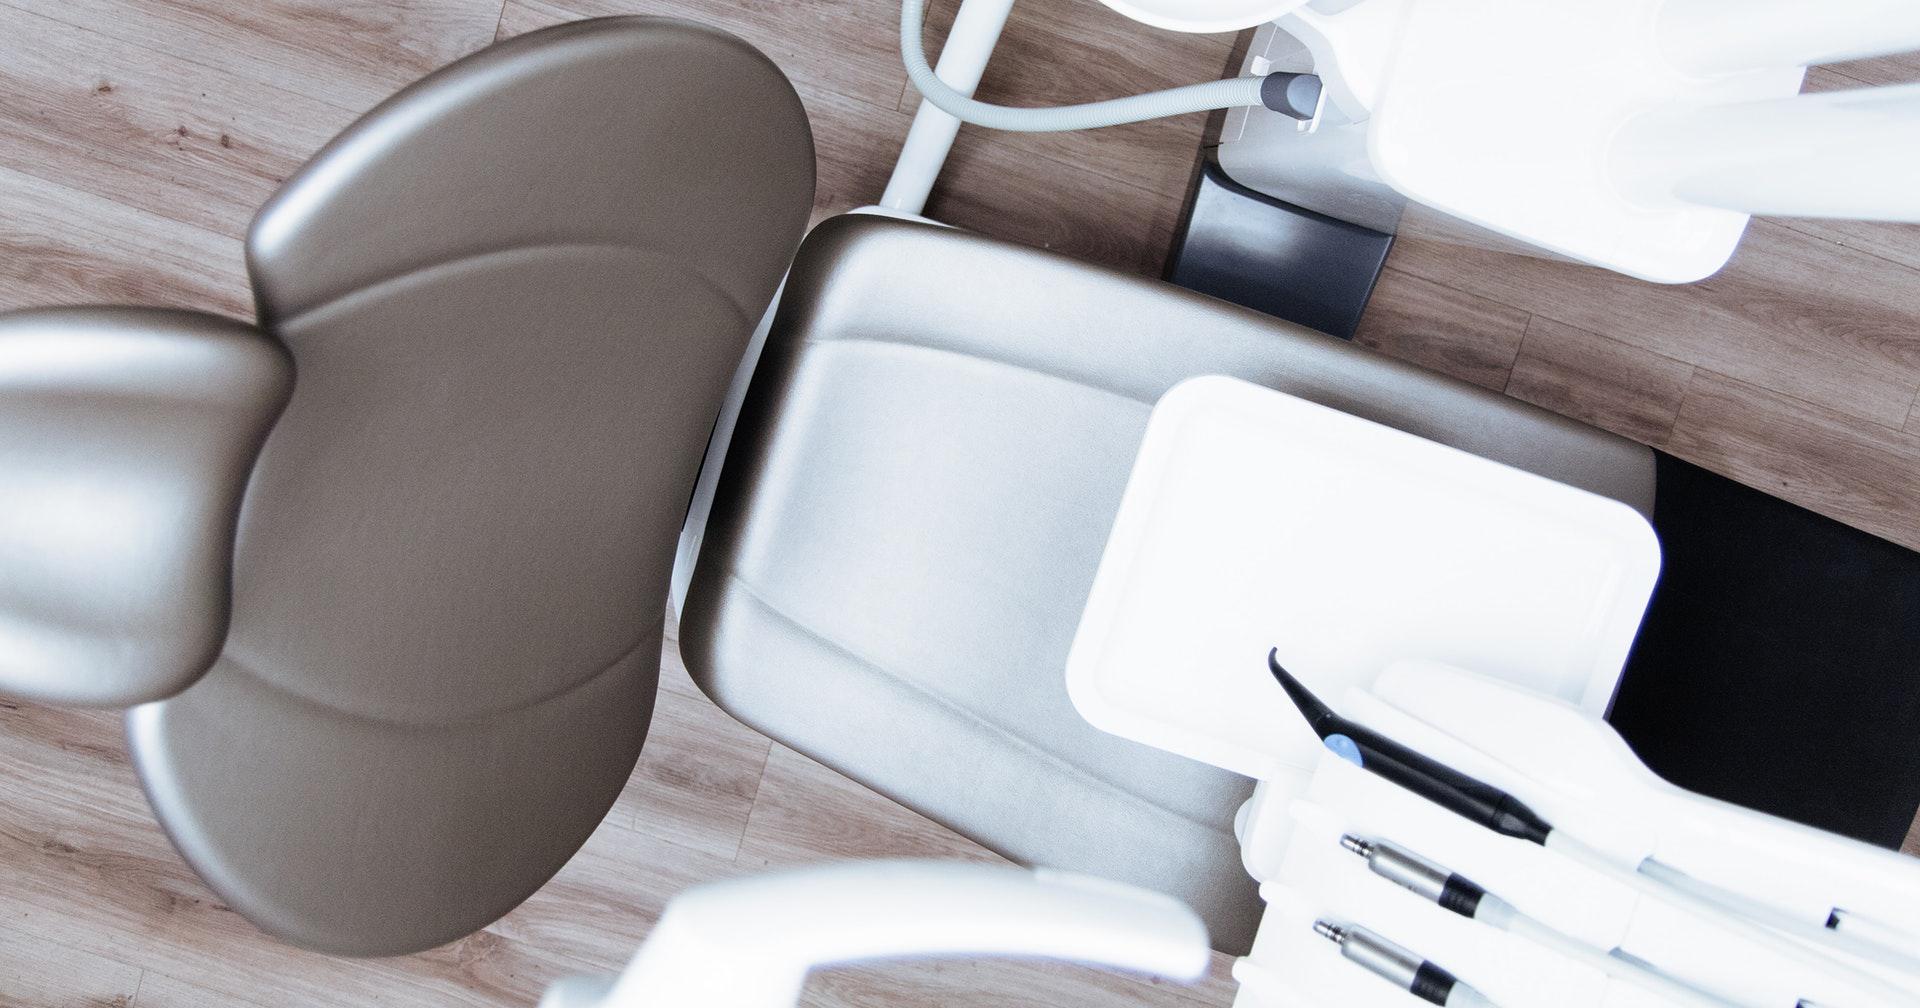 tannlege-tannregulering oslo-regulering oslo-kjeveortepedi-Nina Torgersbråten-Reguleringstannlege